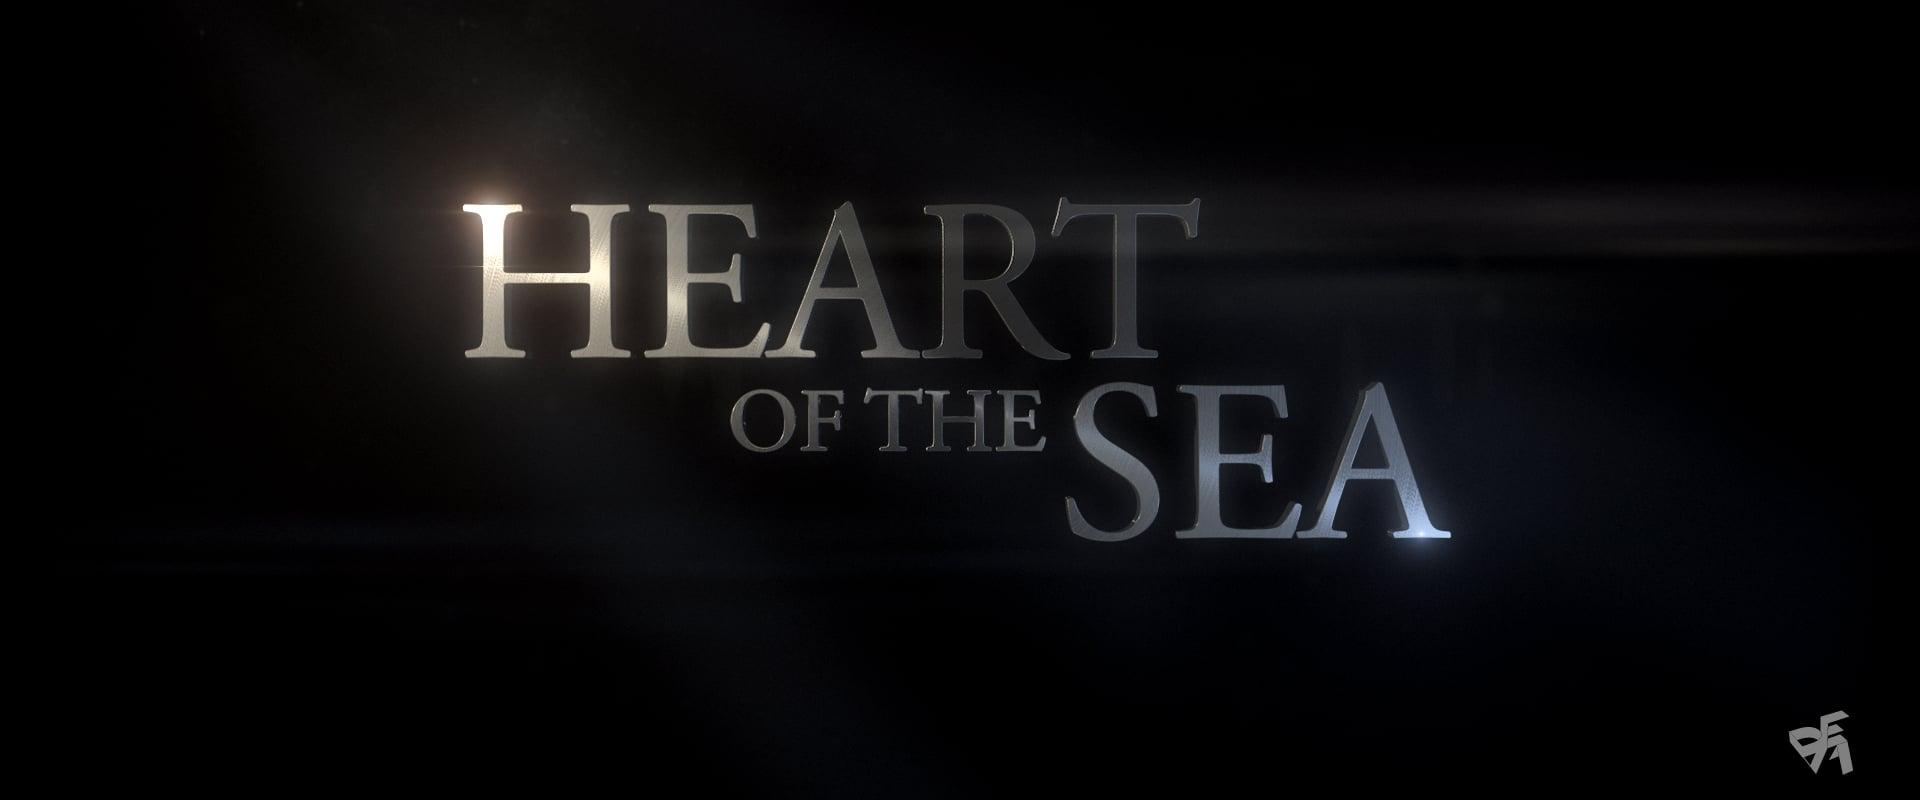 HeartoftheSea-STYLEFRAME_02.jpg